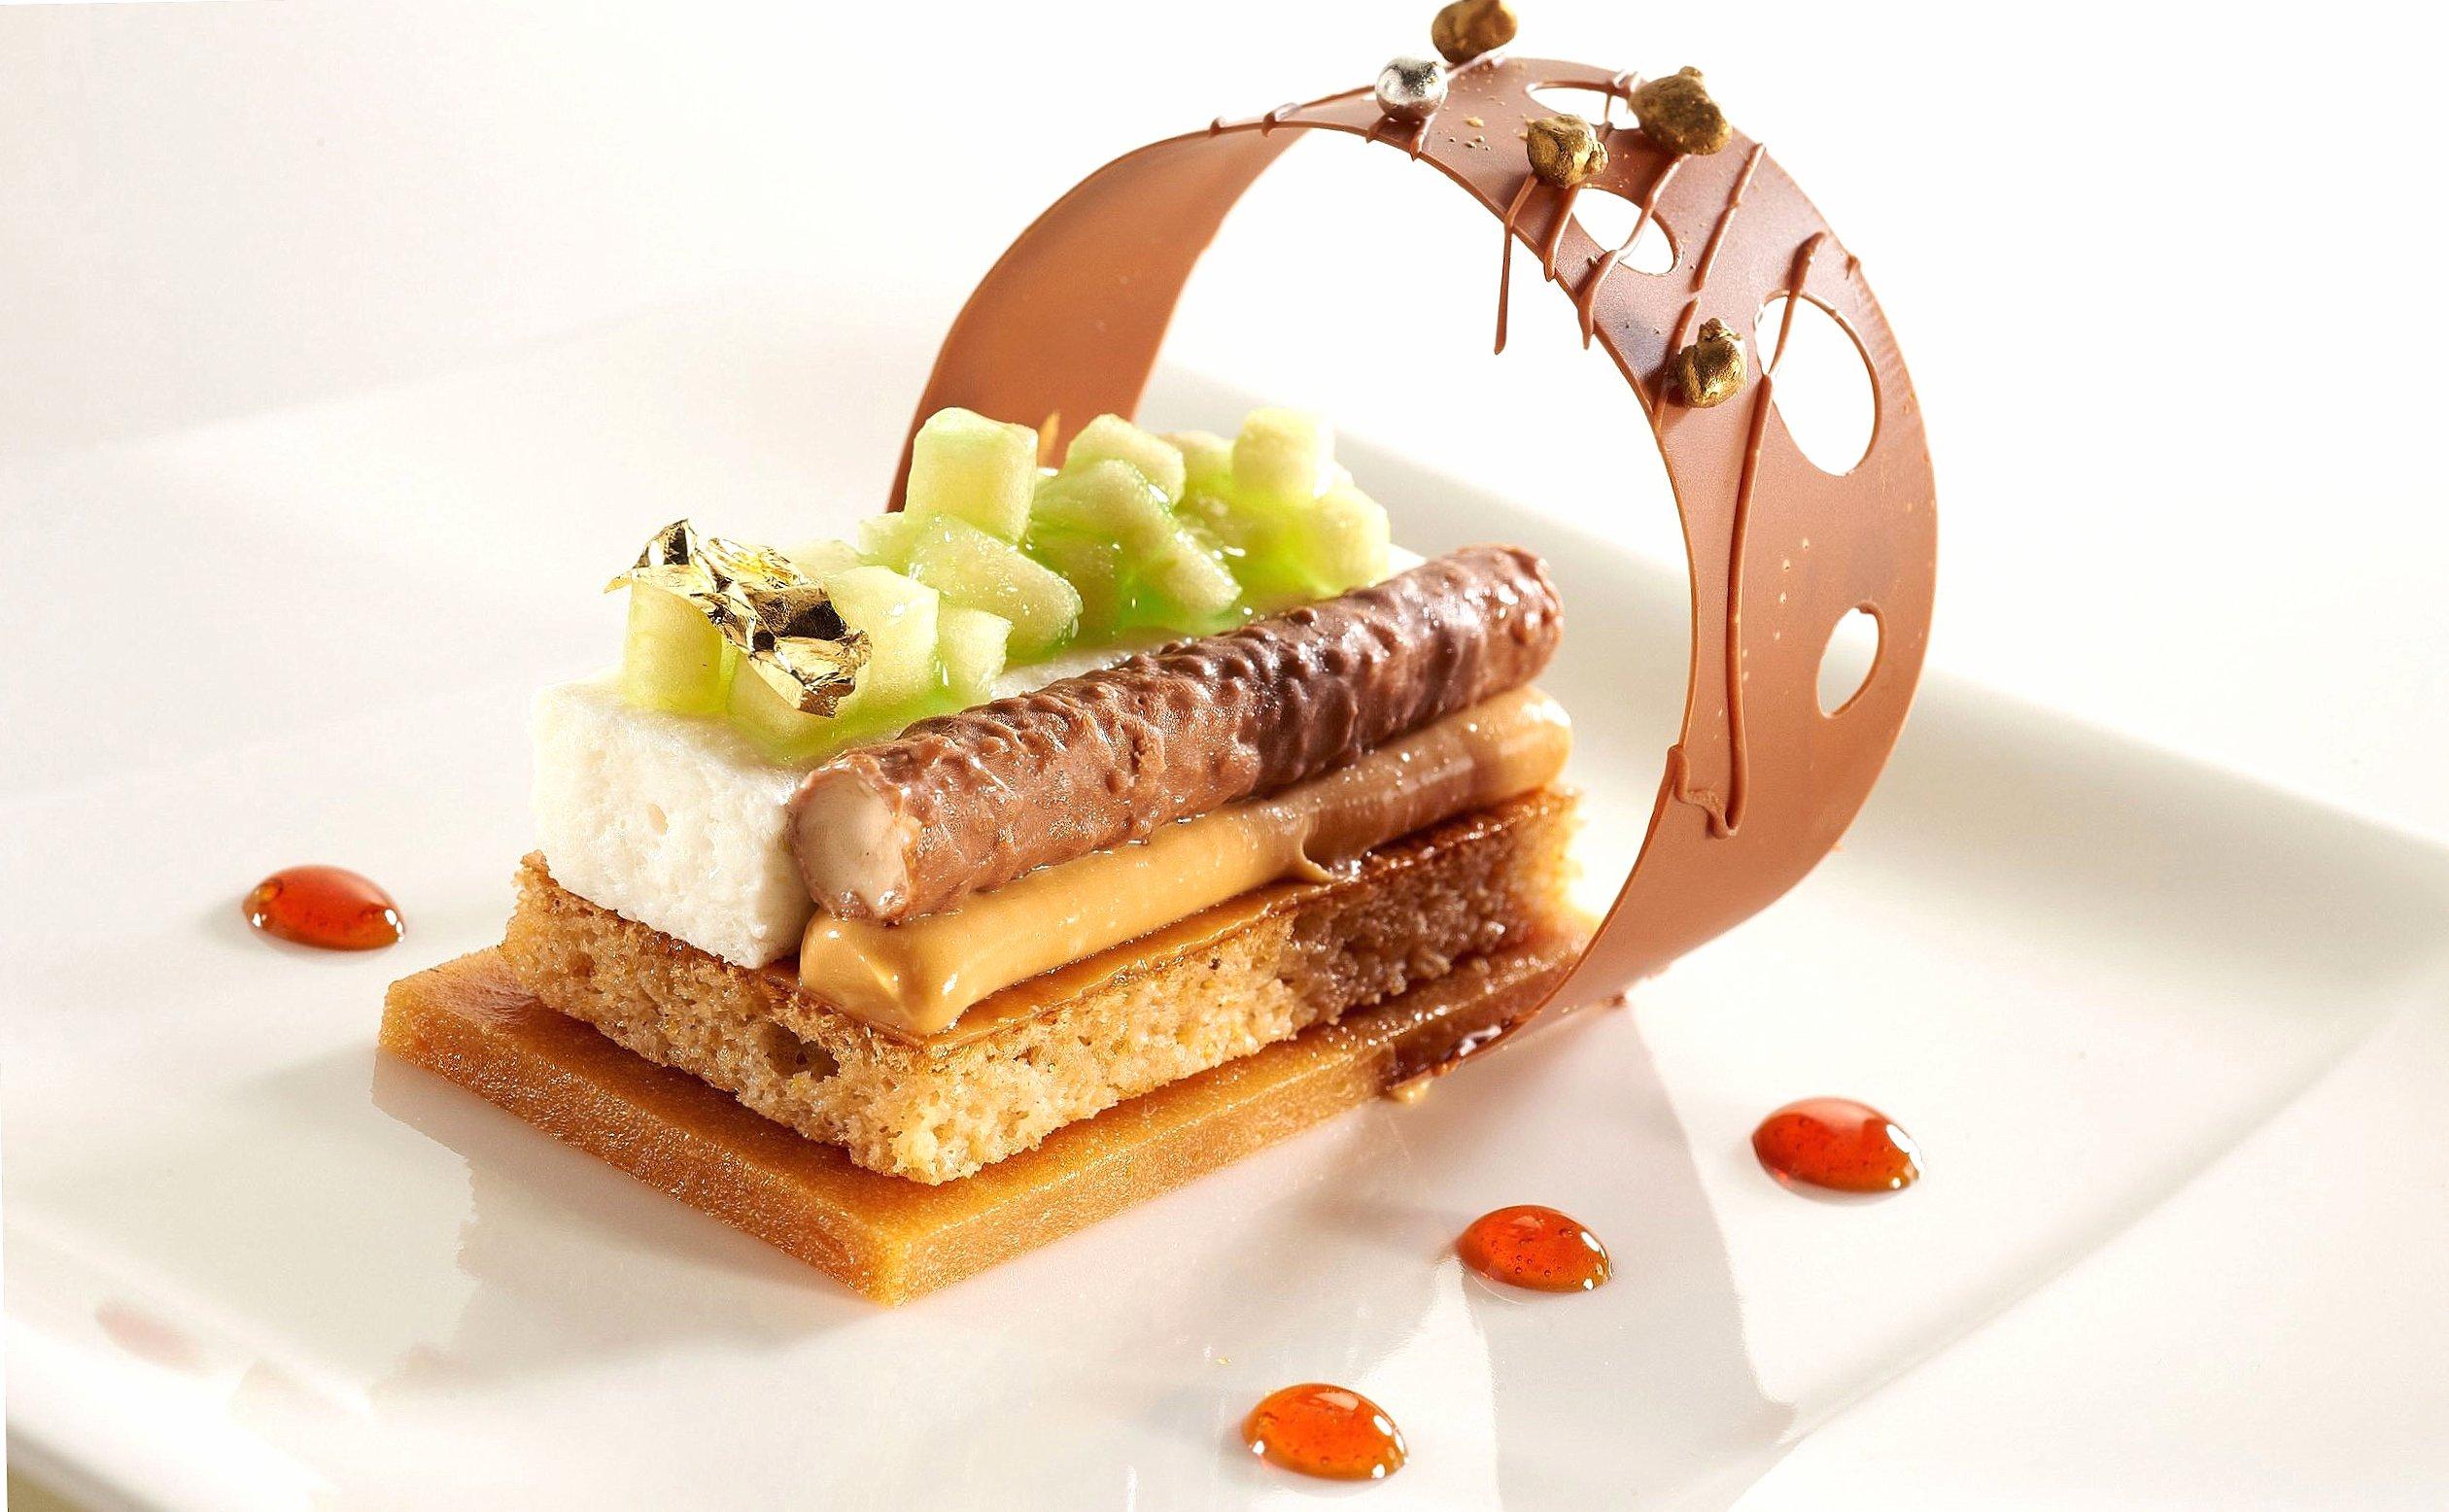 Interesting chocolate dessert wallpapers HD quality